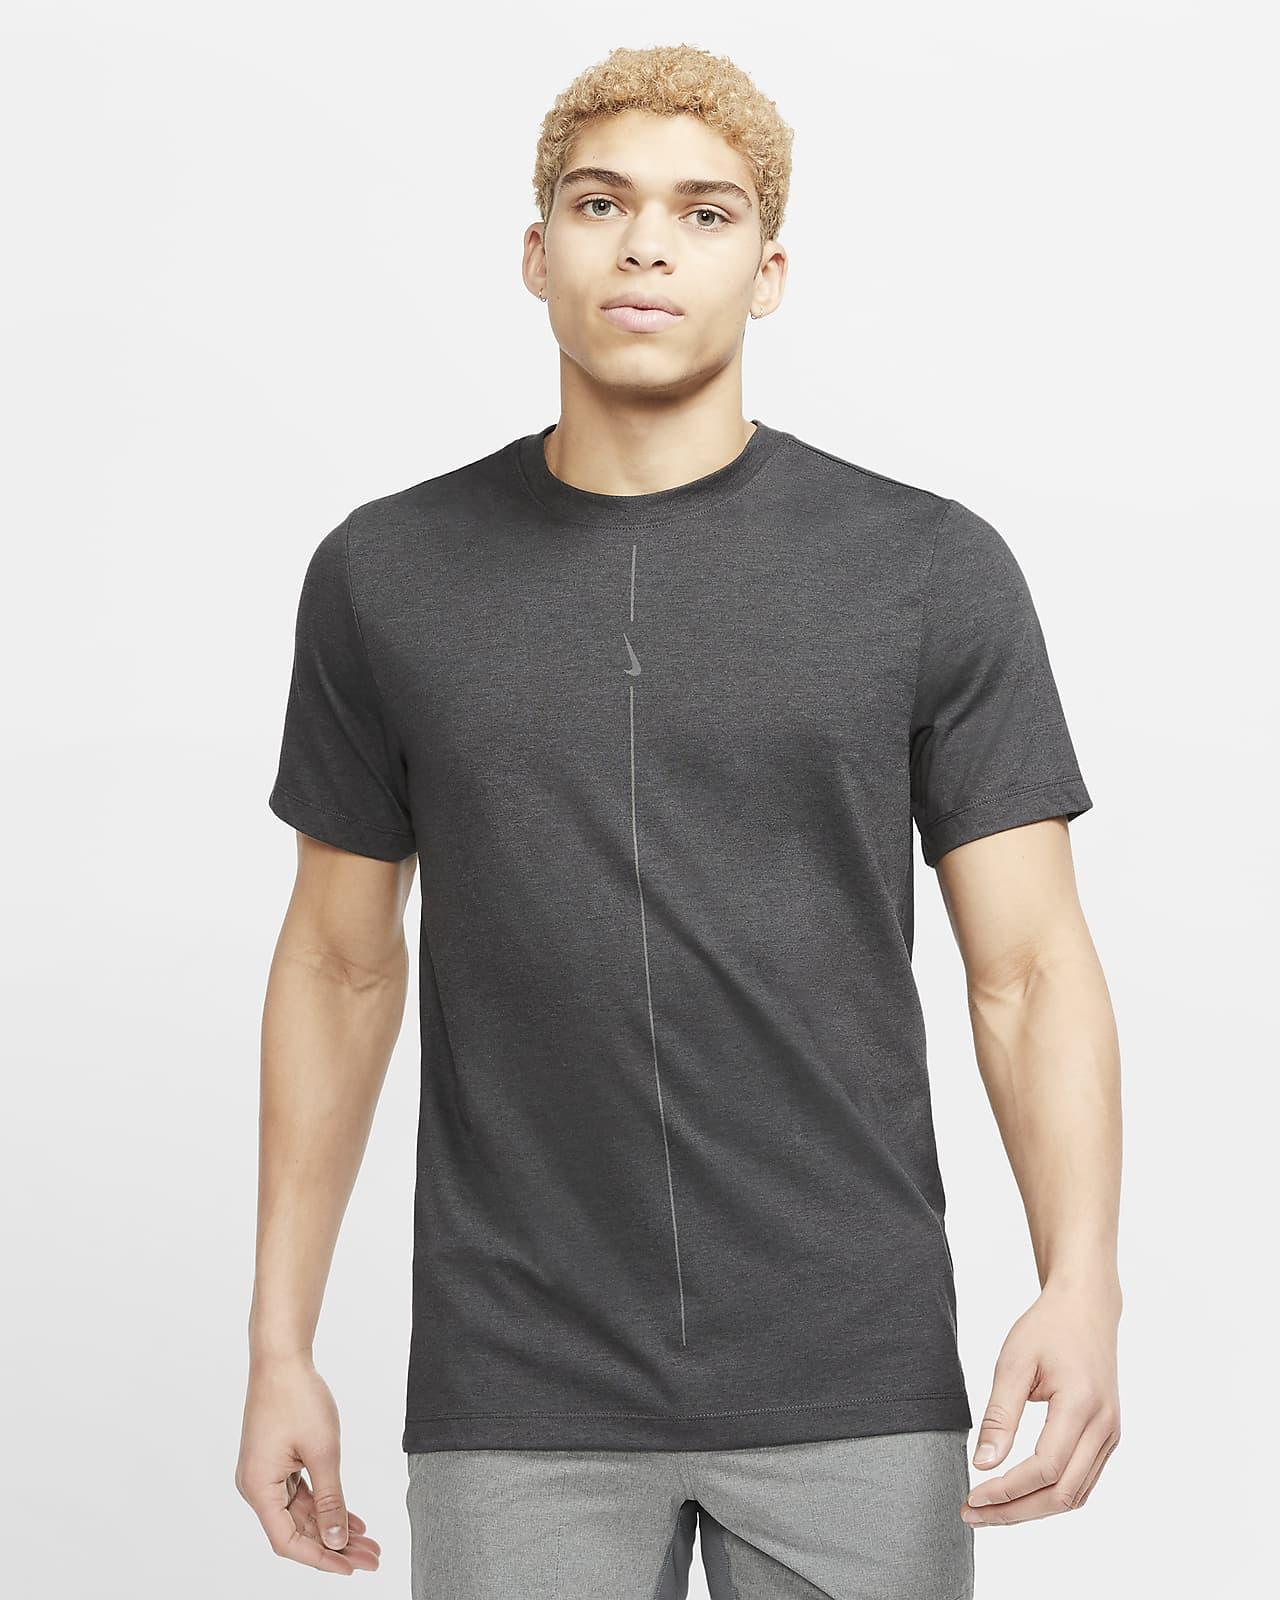 T-shirt Nike Yoga Dri-FIT för män